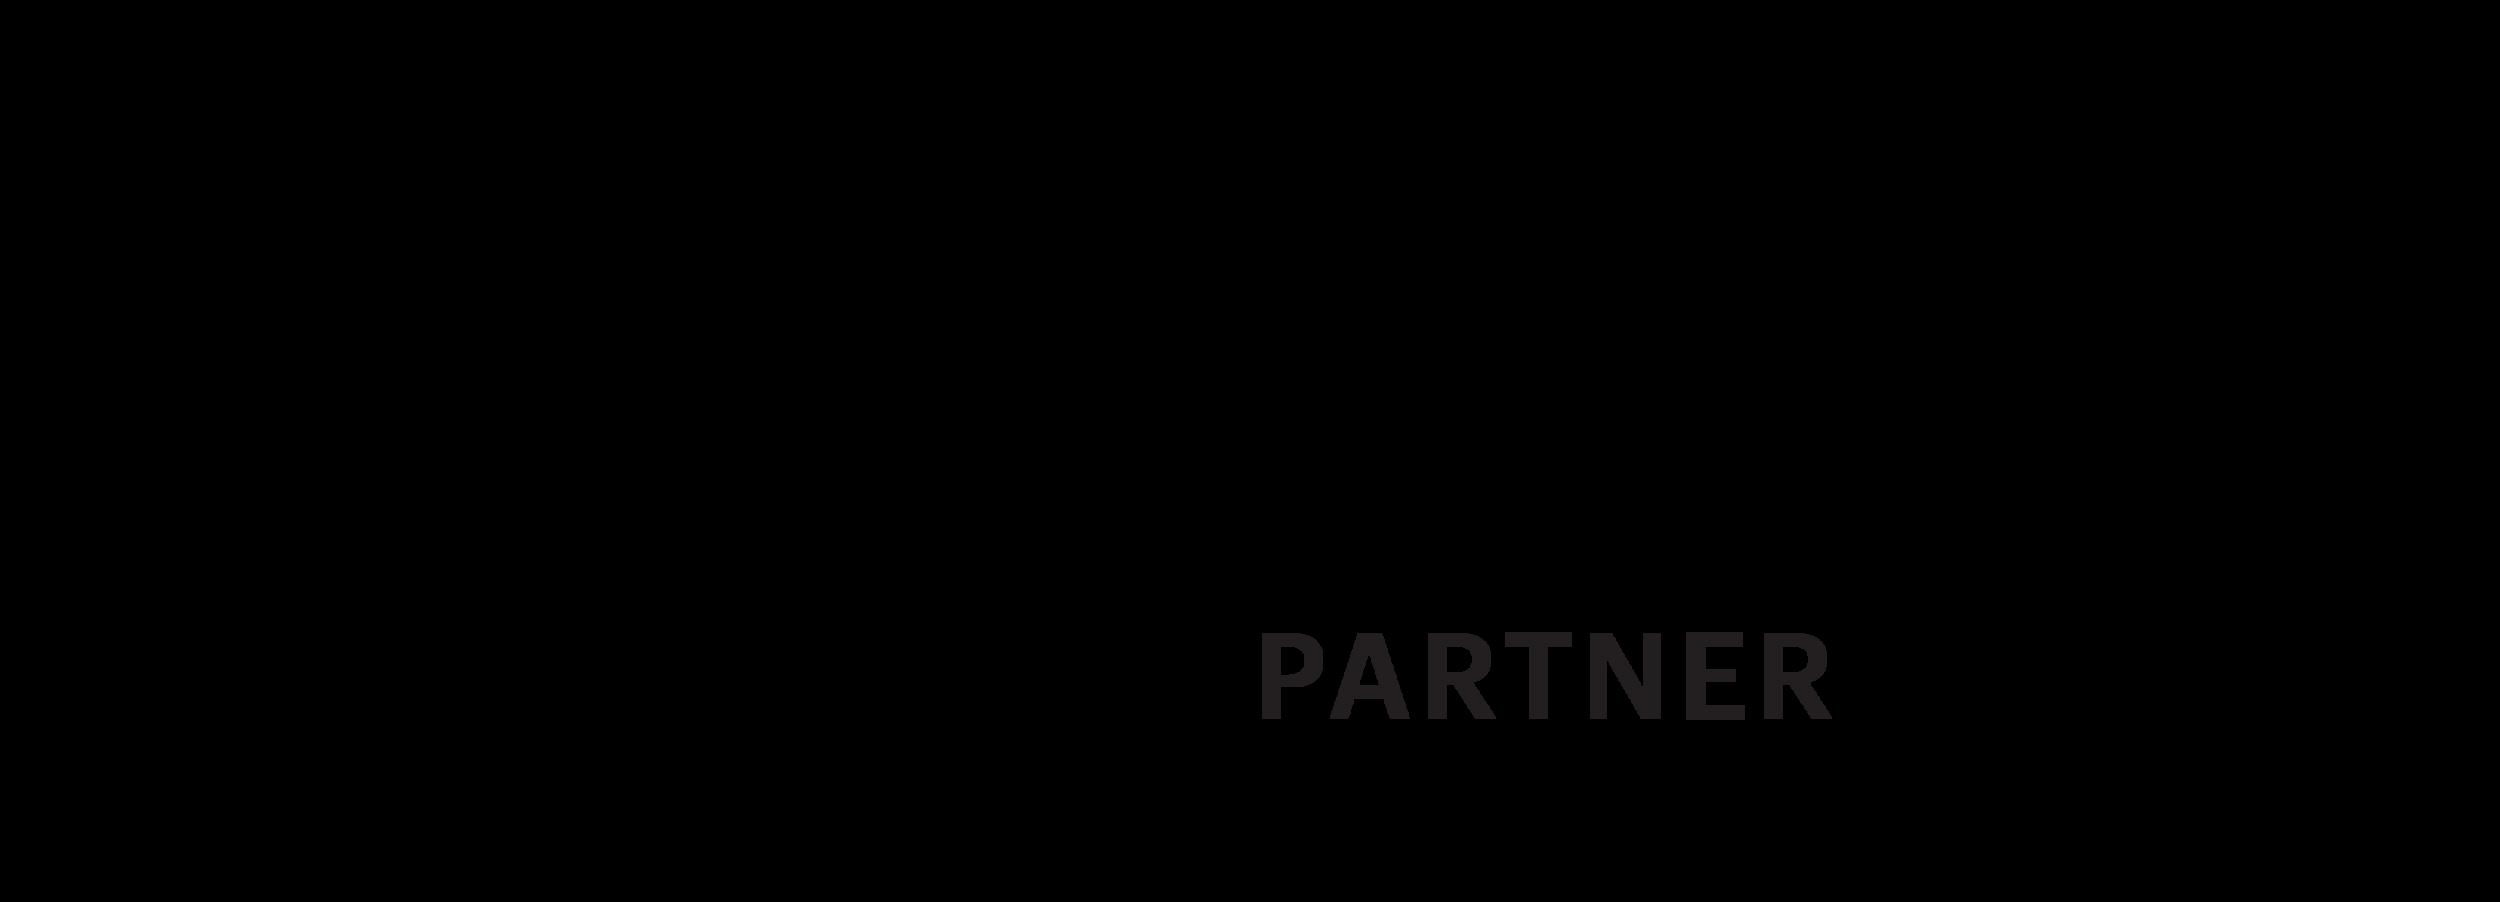 Mailchimp Partner Program DailyMode Studio.png